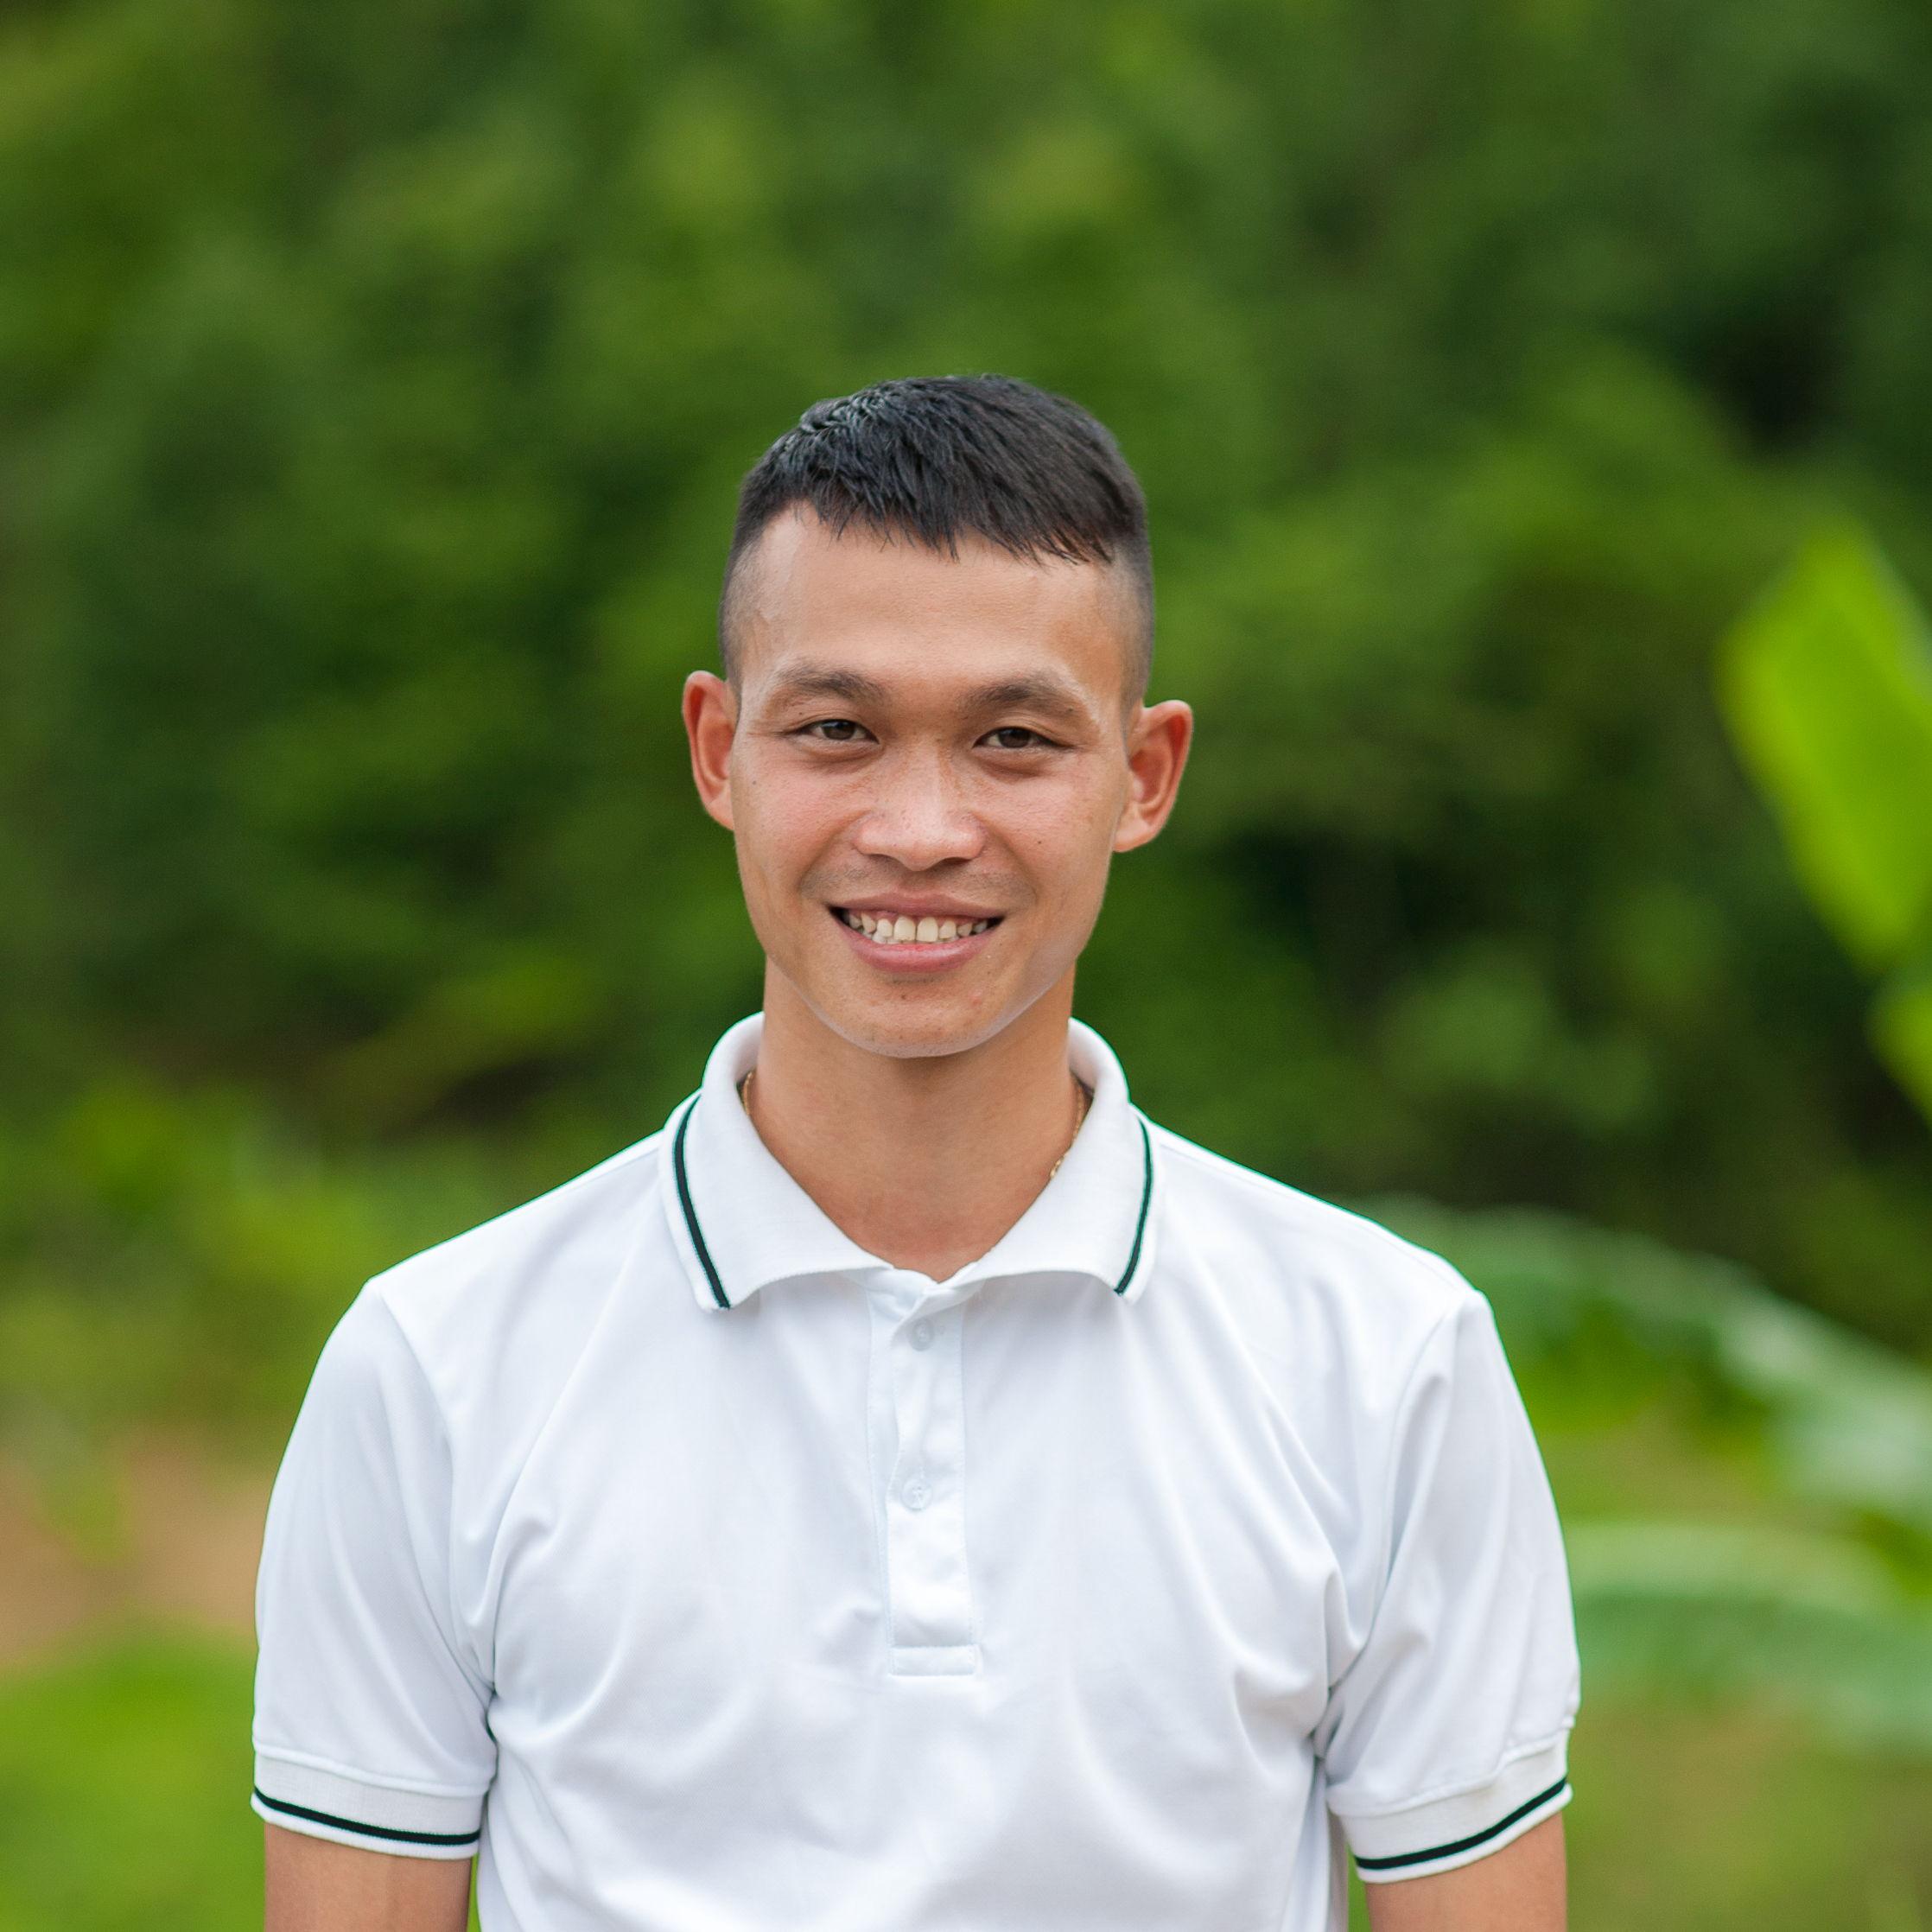 Nguyễn Phan Huyền